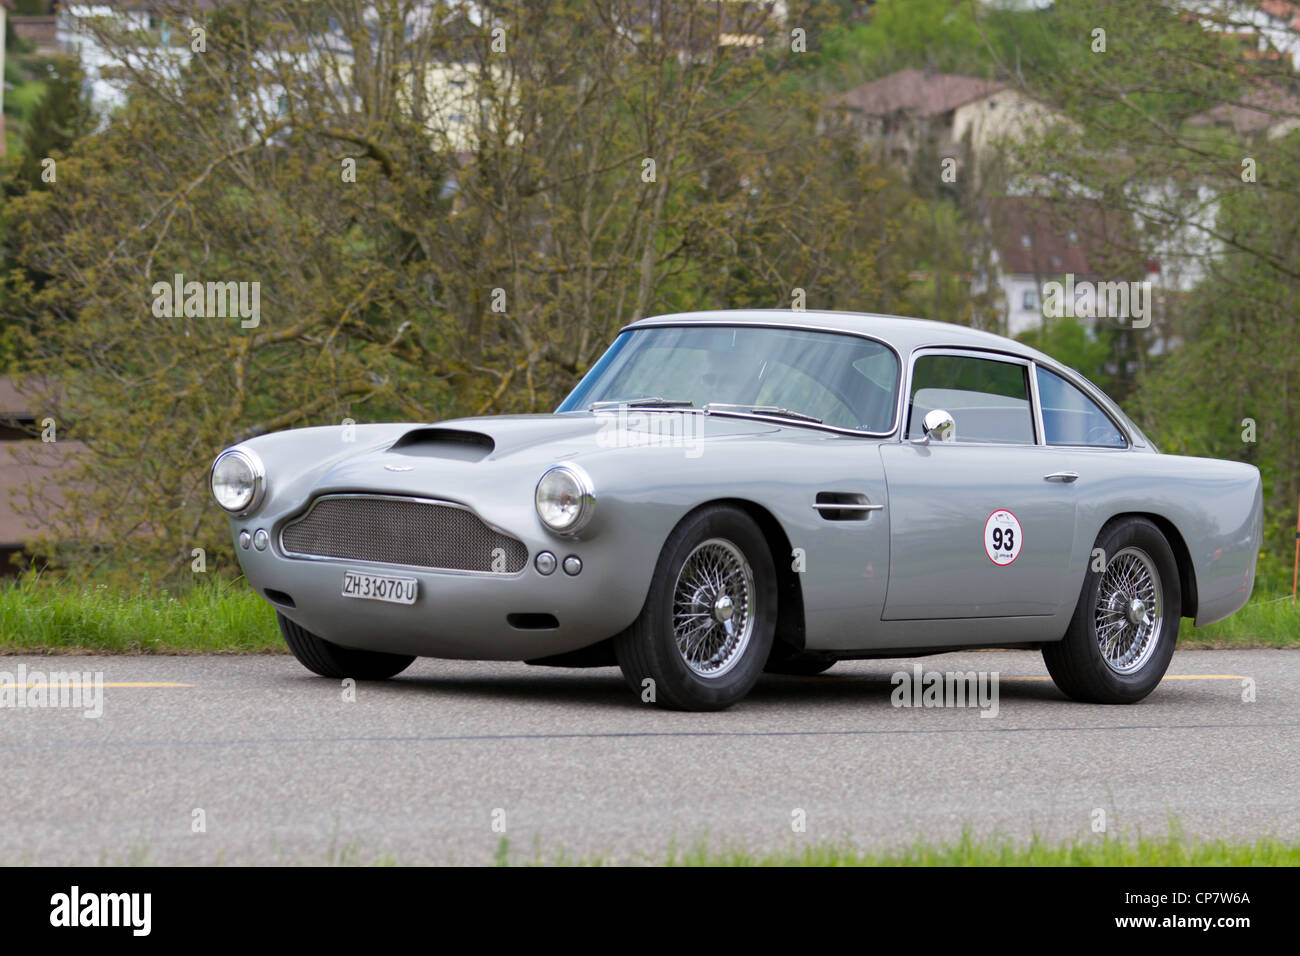 Vintage car Aston Martin at Grand Prix in Mutschellen, SUI on April 29, 2012. - Stock Image